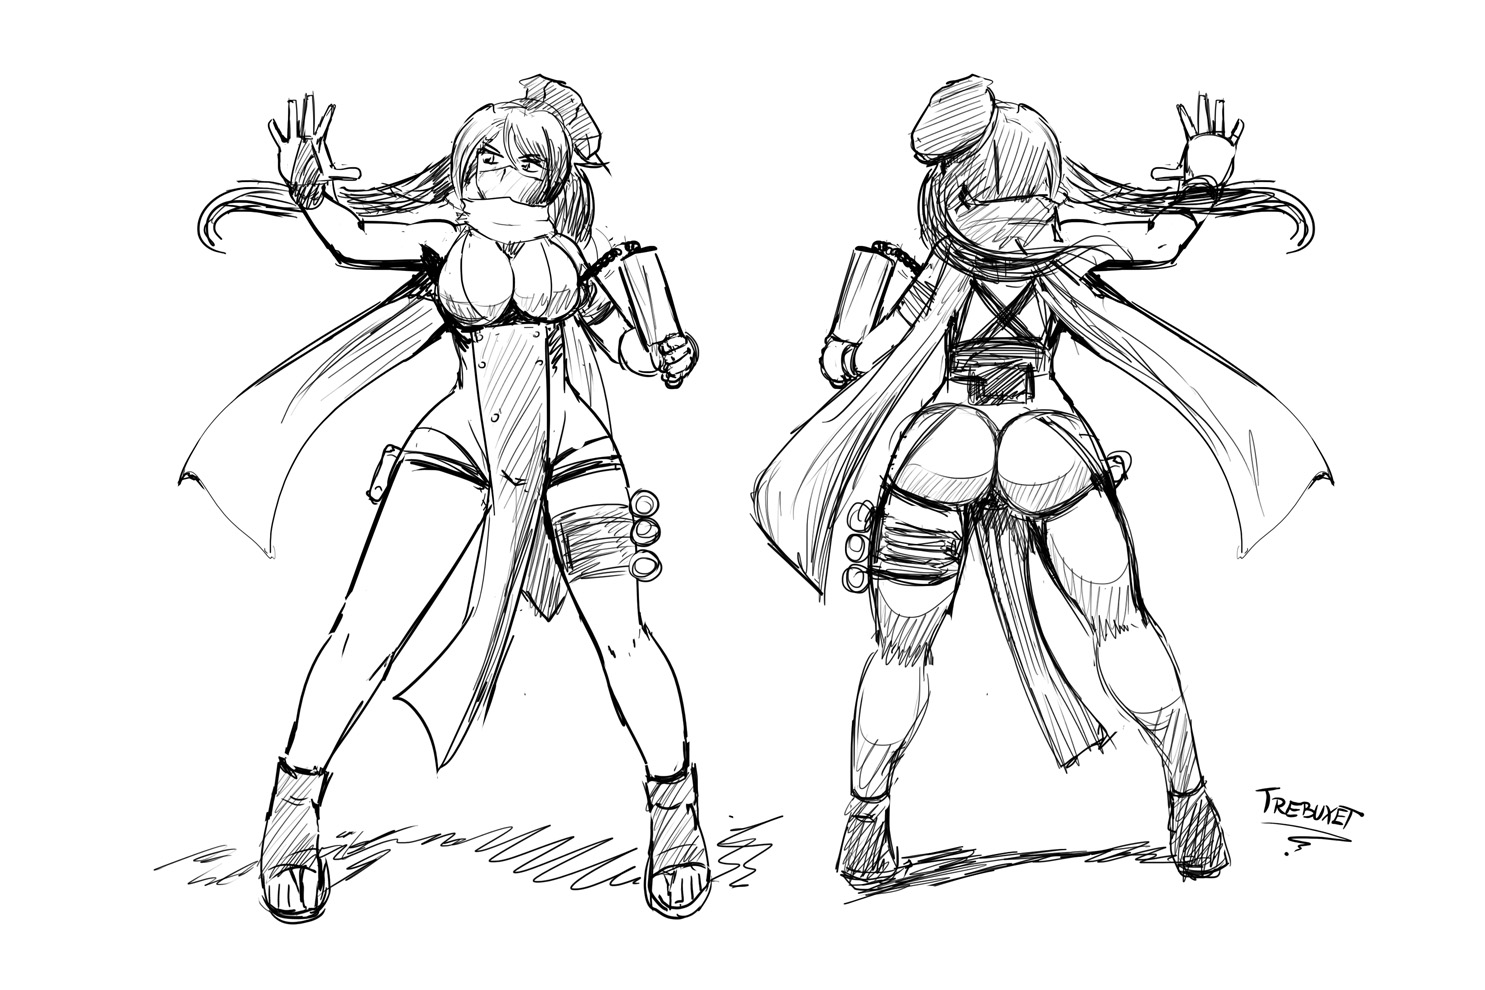 Ninja Pastry Chef Sketch